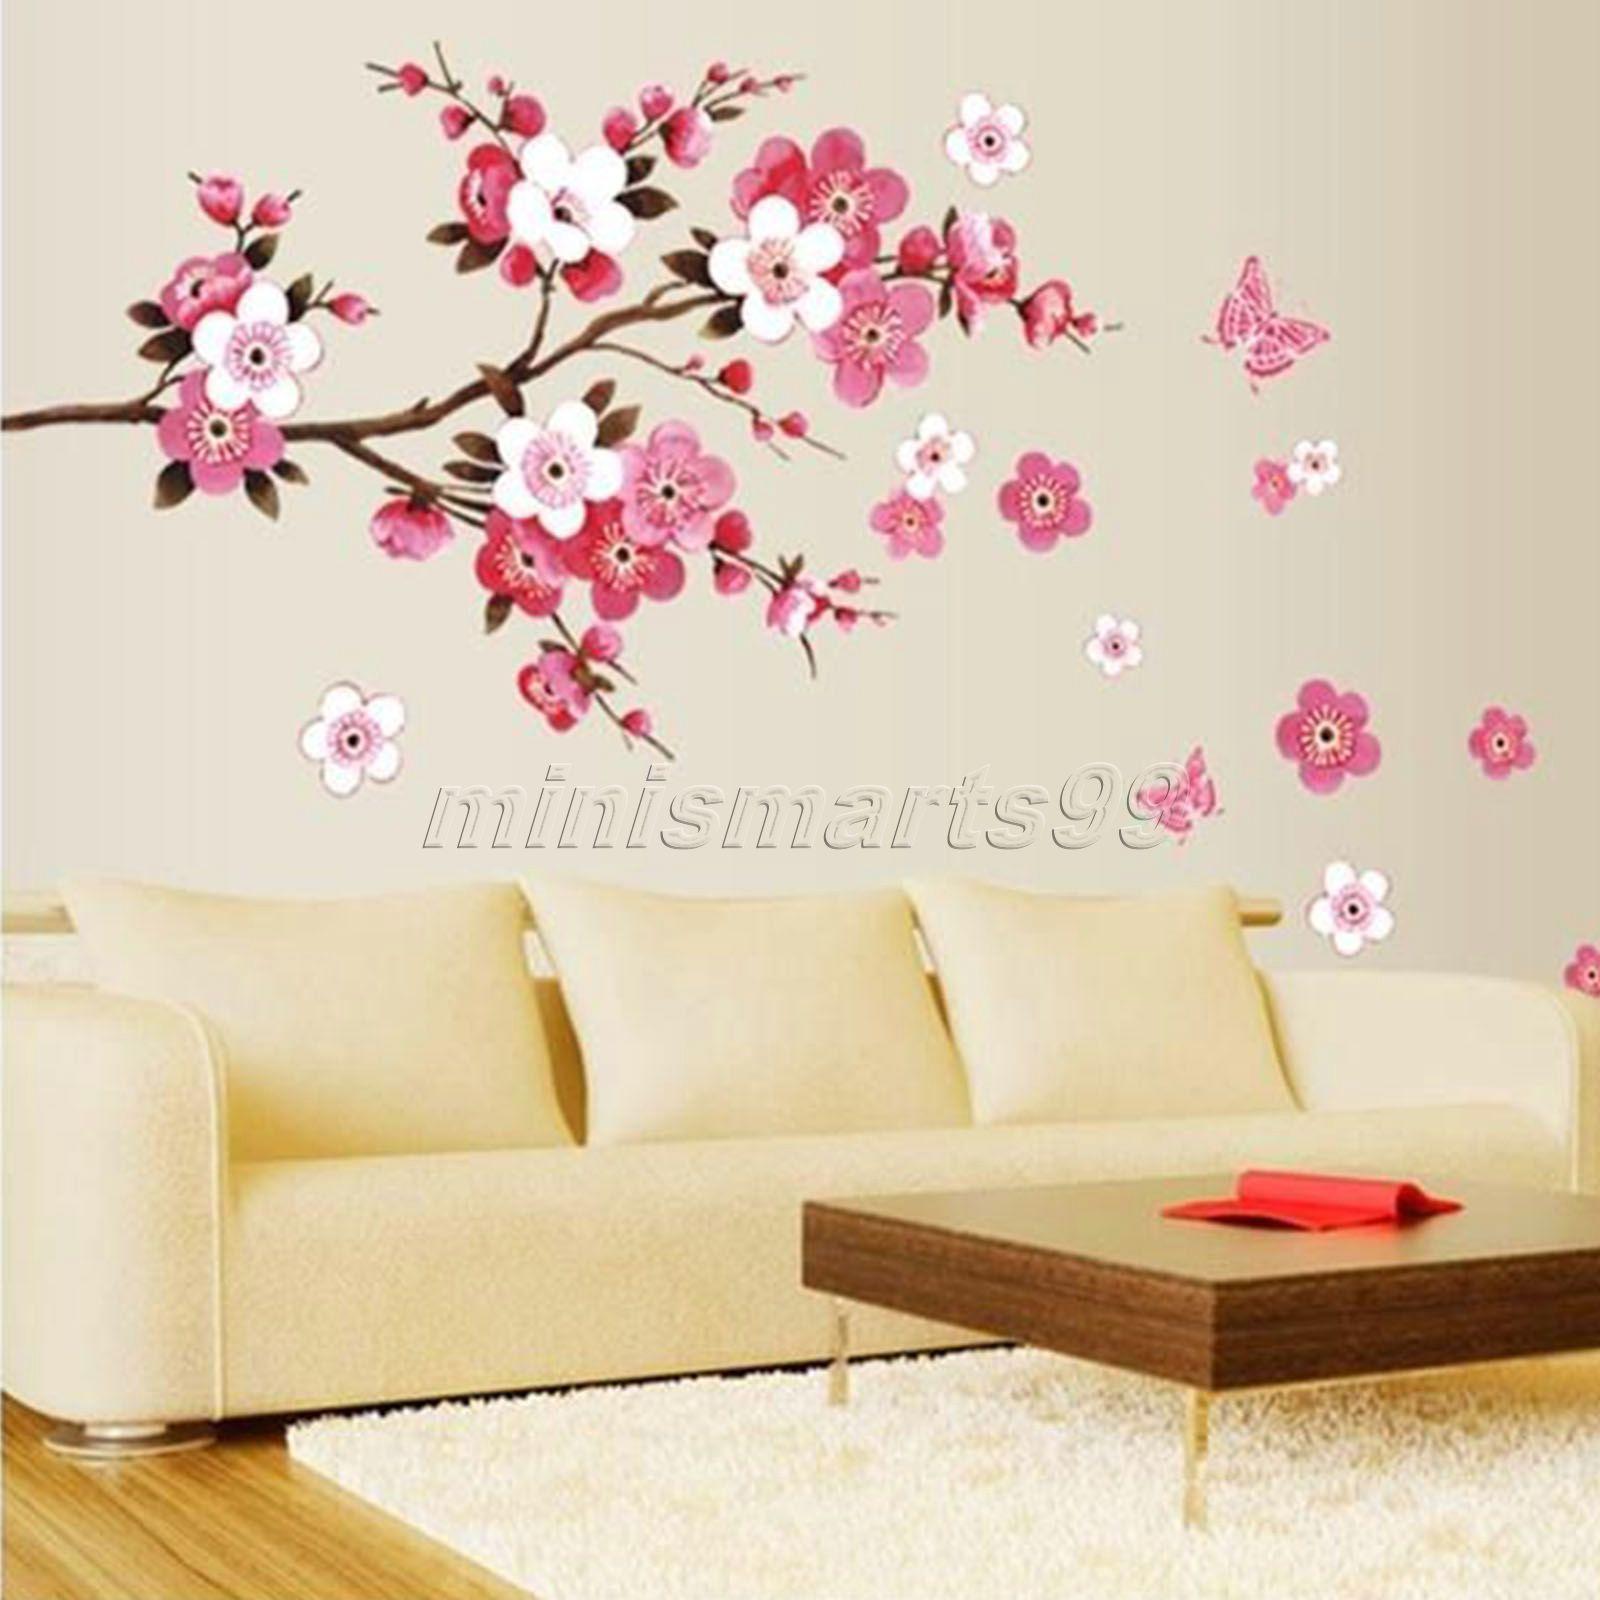 US $3.78 29% OFF Sakura Blume Schmetterling Kirschblüte Wandtattoo  Kindergarten Baum Blumen Schmetterling Kunst Kinderzimmer Wandaufkleber  Natur Wand ...